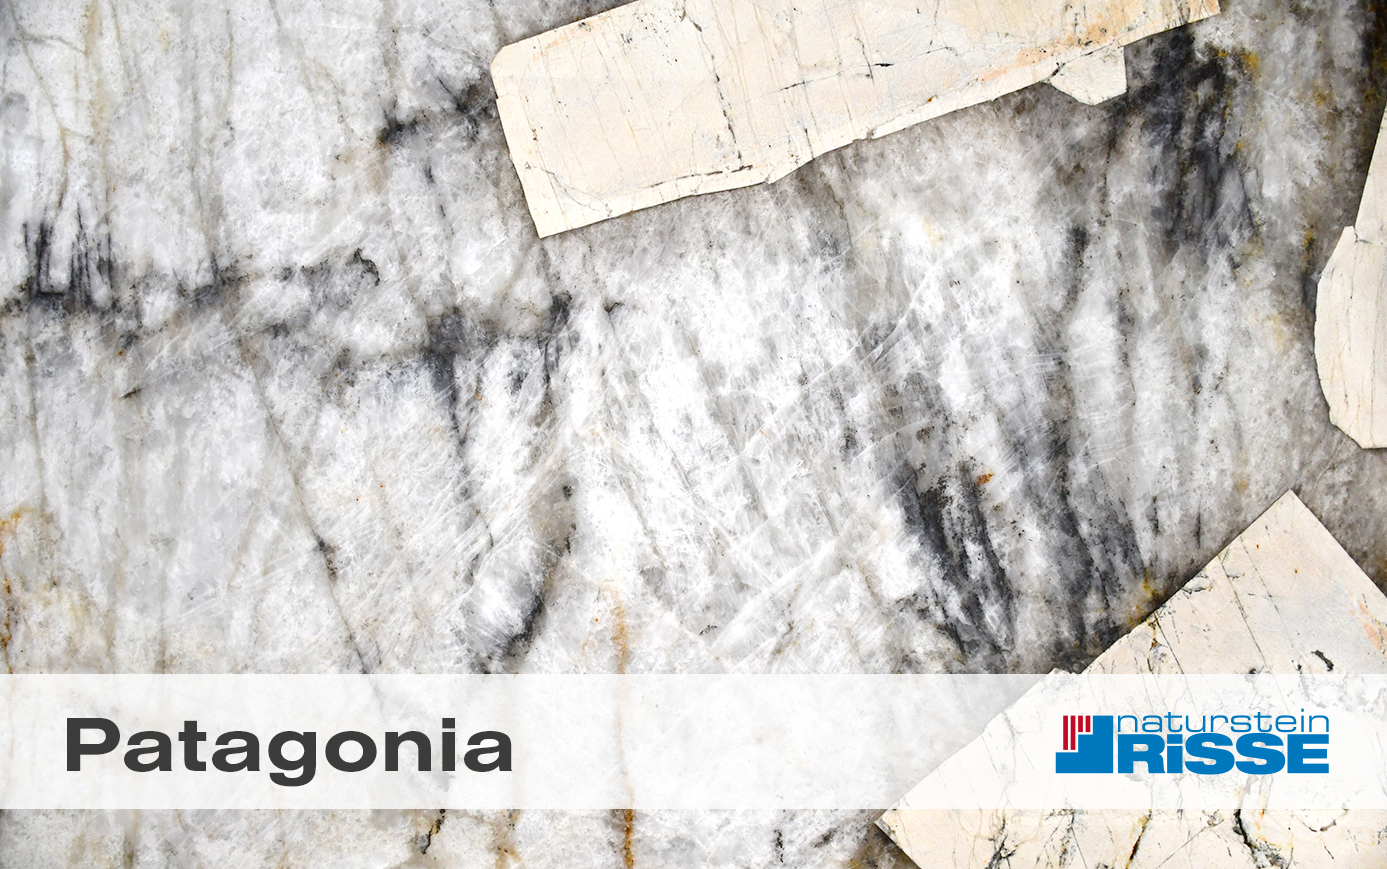 patagonia_vorschau_risse_blog